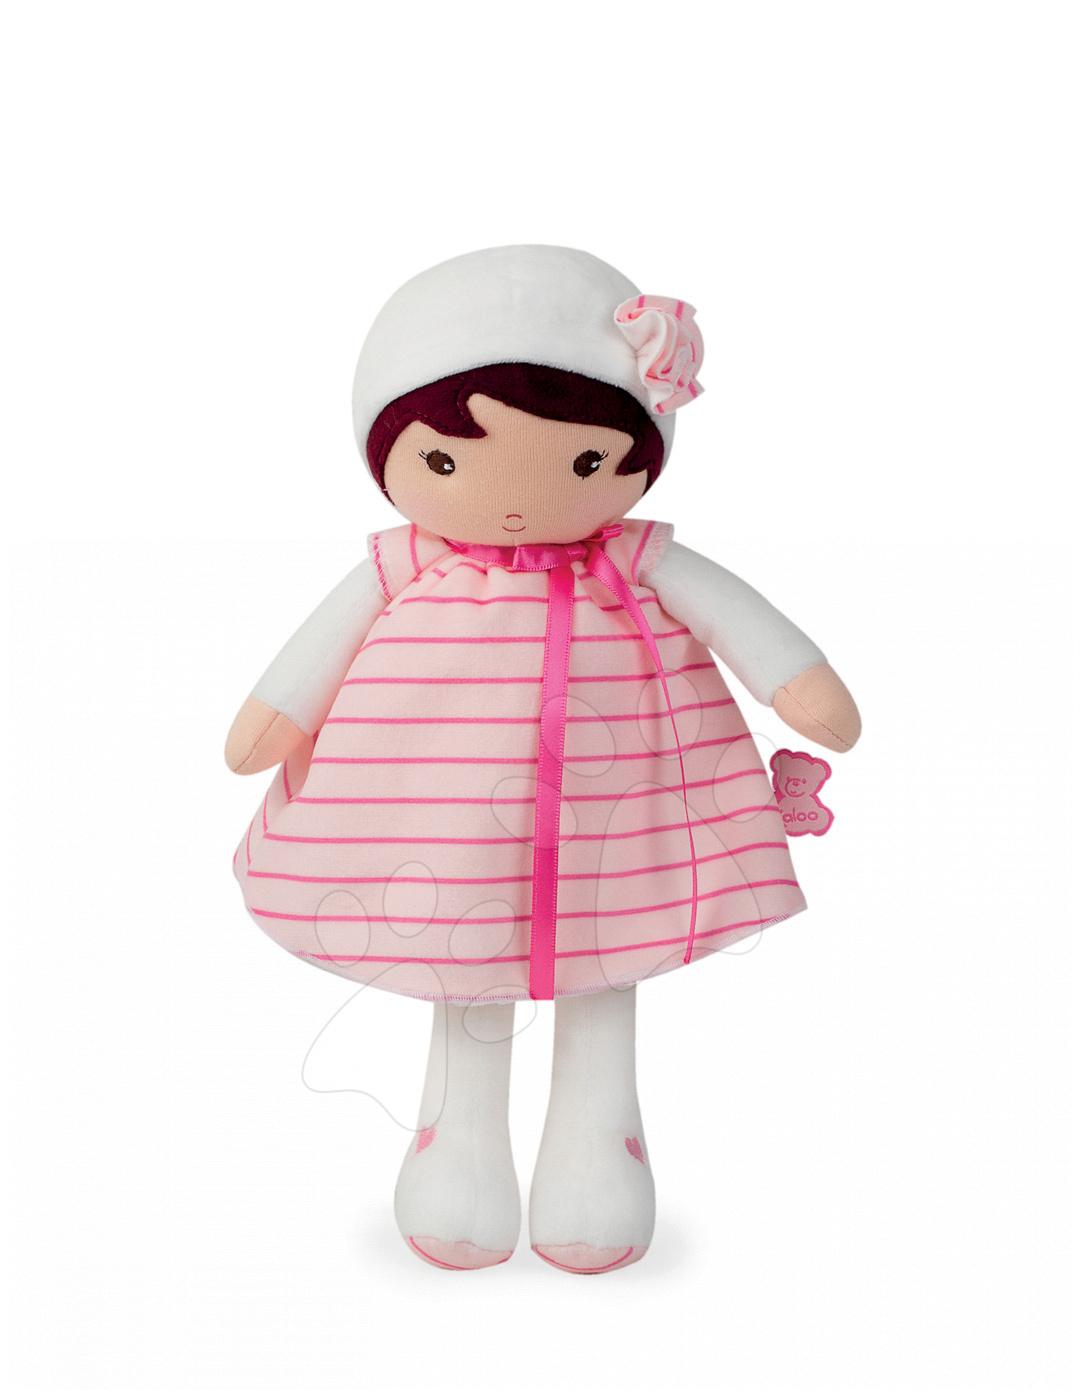 Bábika pre najmenších Rose K Tendresse Kaloo v pásikavých šatách z jemného textilu v darčekovom balení 32 cm